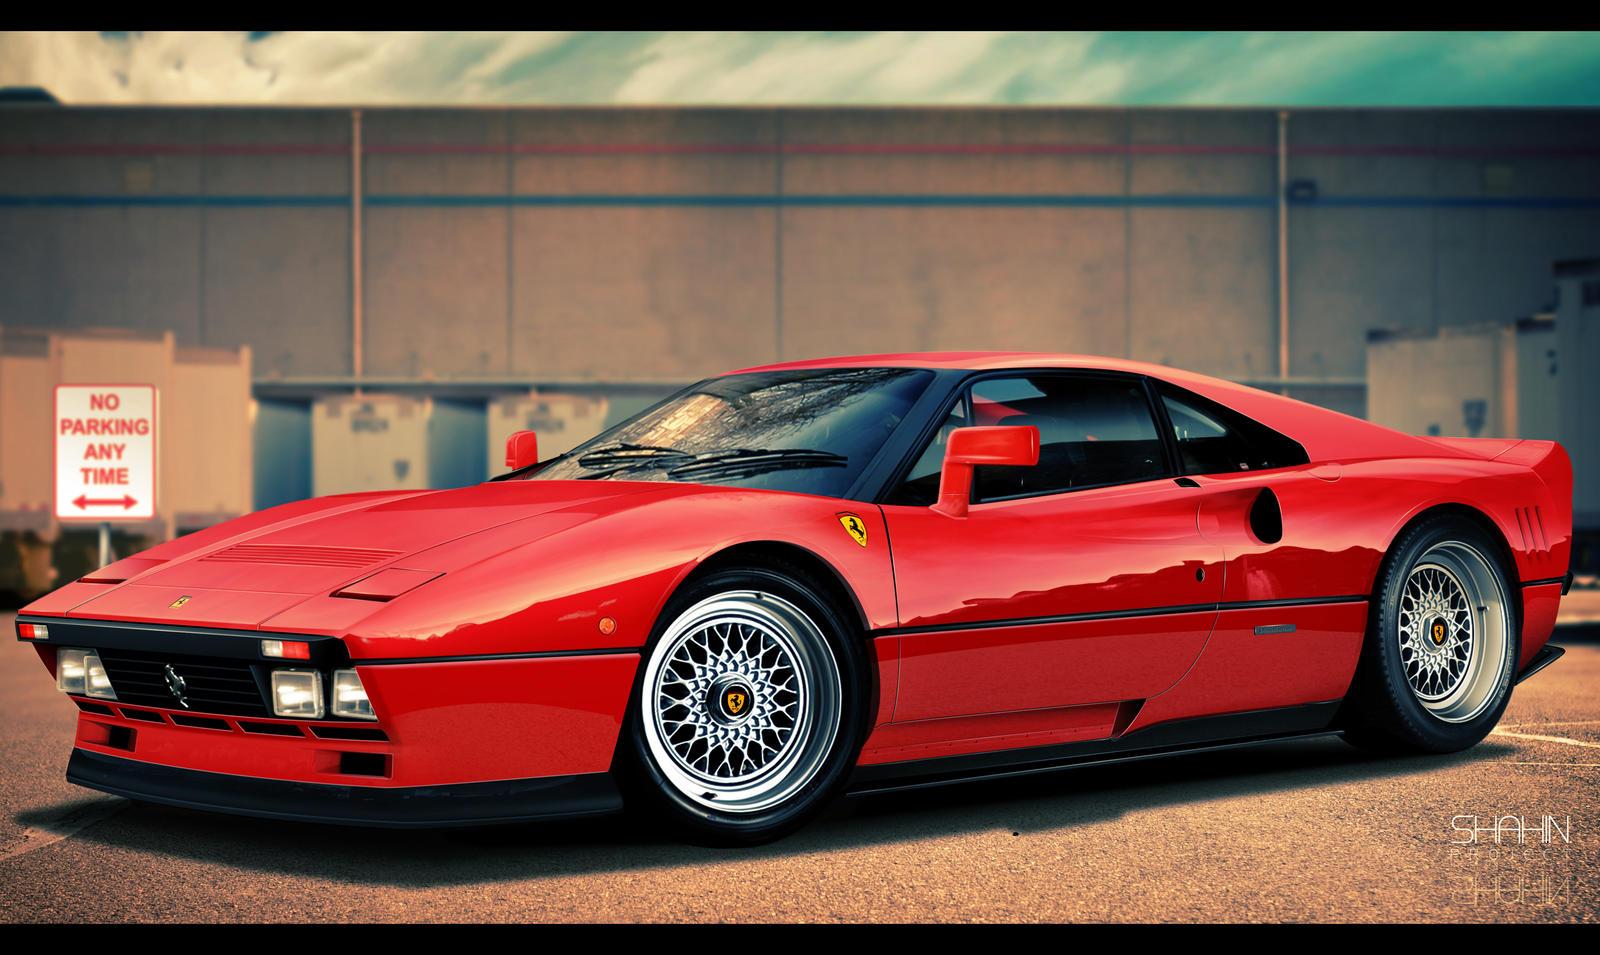 Ferrari 288 Gto By Tuninger On Deviantart